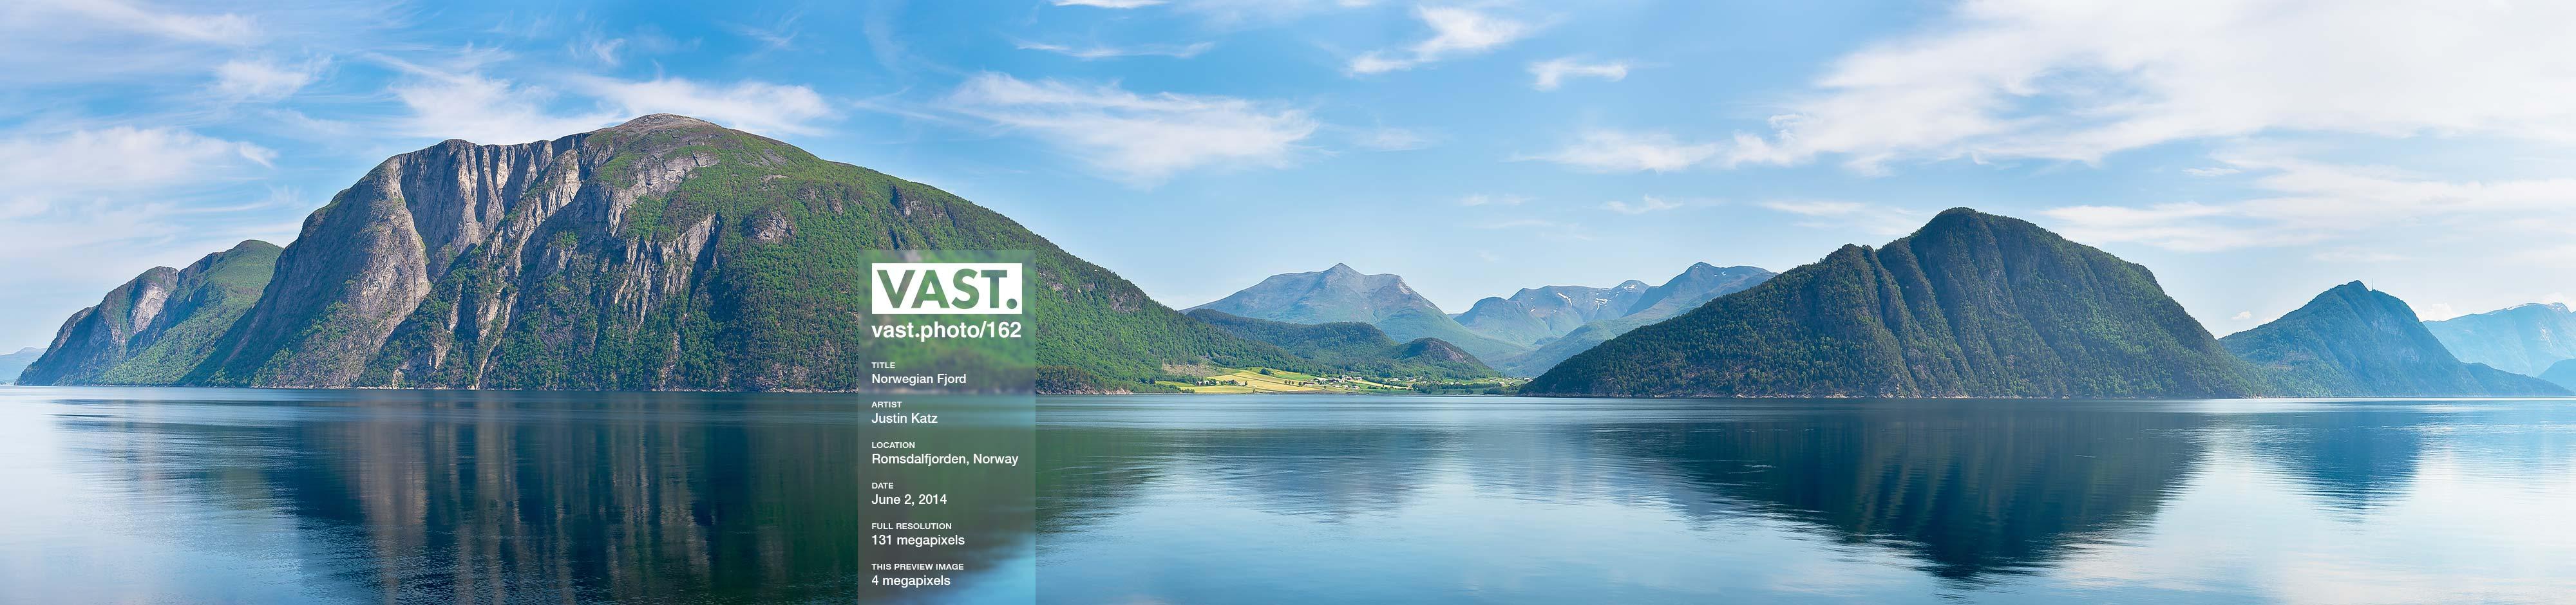 Norway Fjords Landscape Photos: High Quality Fine Art Prints - VAST